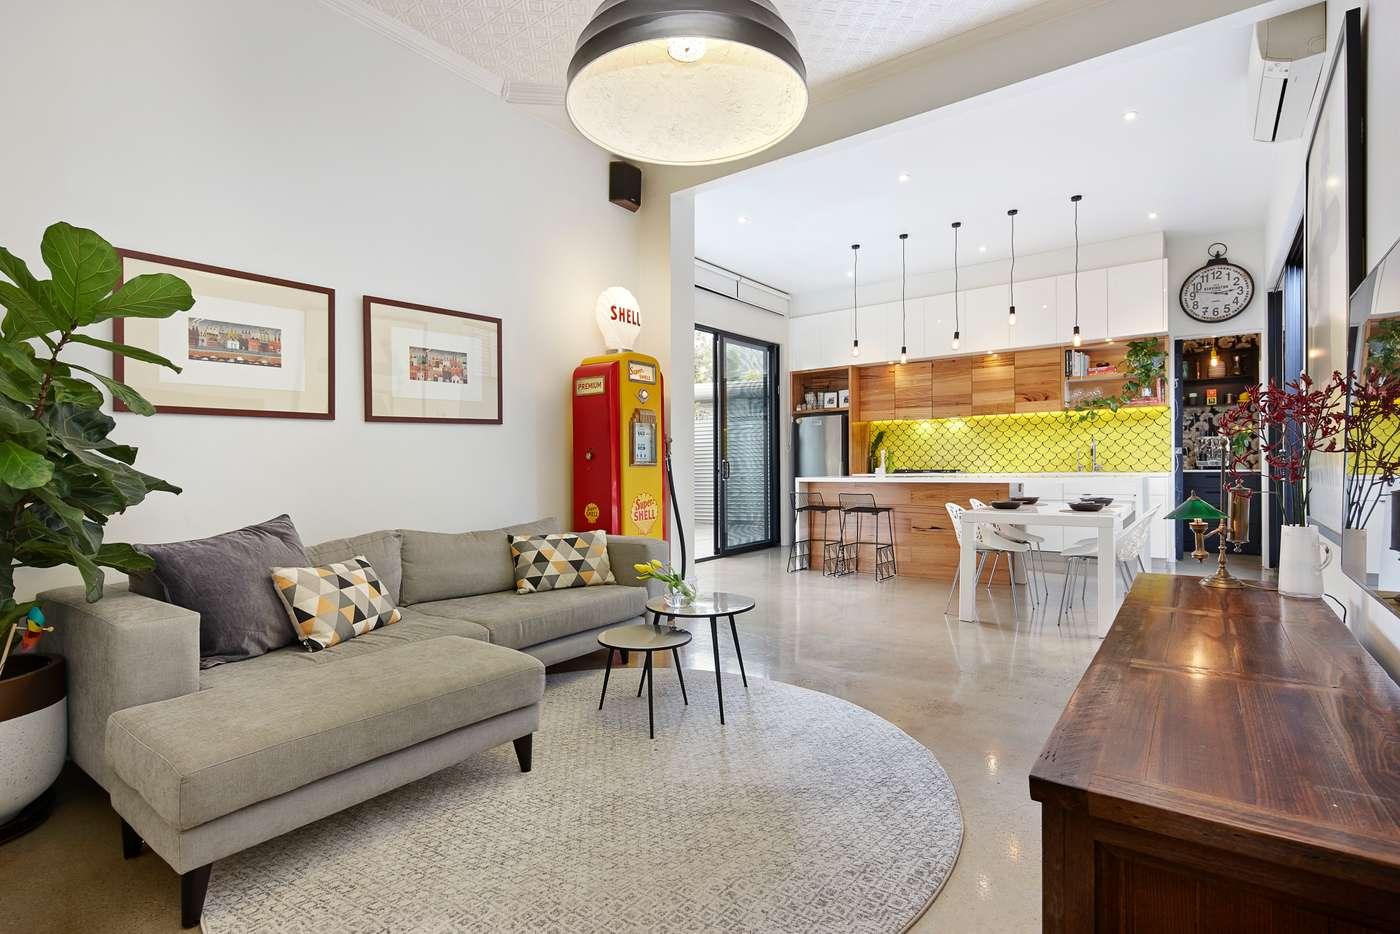 Main view of Homely house listing, 548 Macaulay Road, Kensington VIC 3031